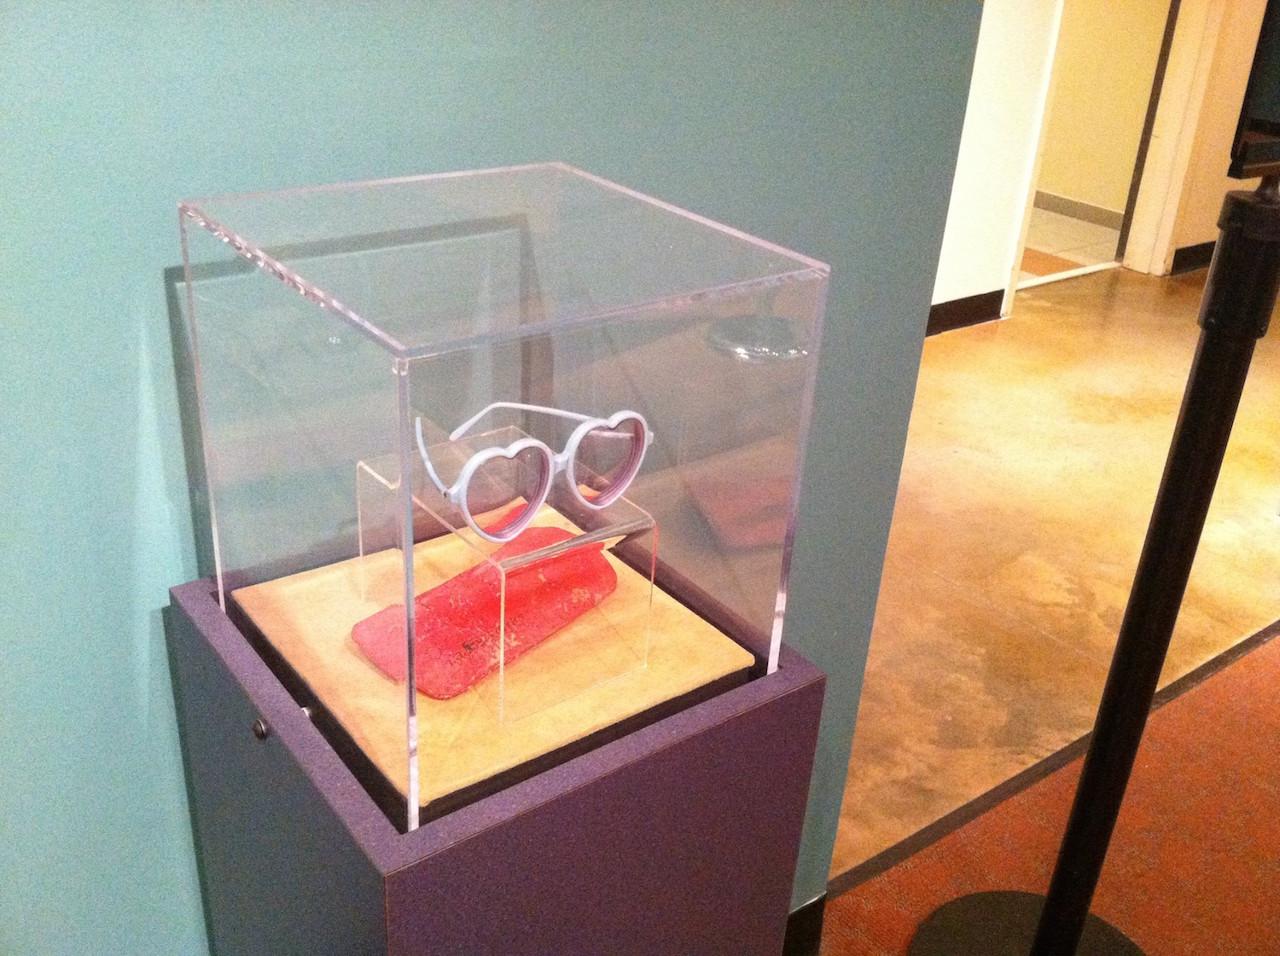 Elton John's glasses in their display case at the Rock 'n' Soul Museum (photo via Facebook)